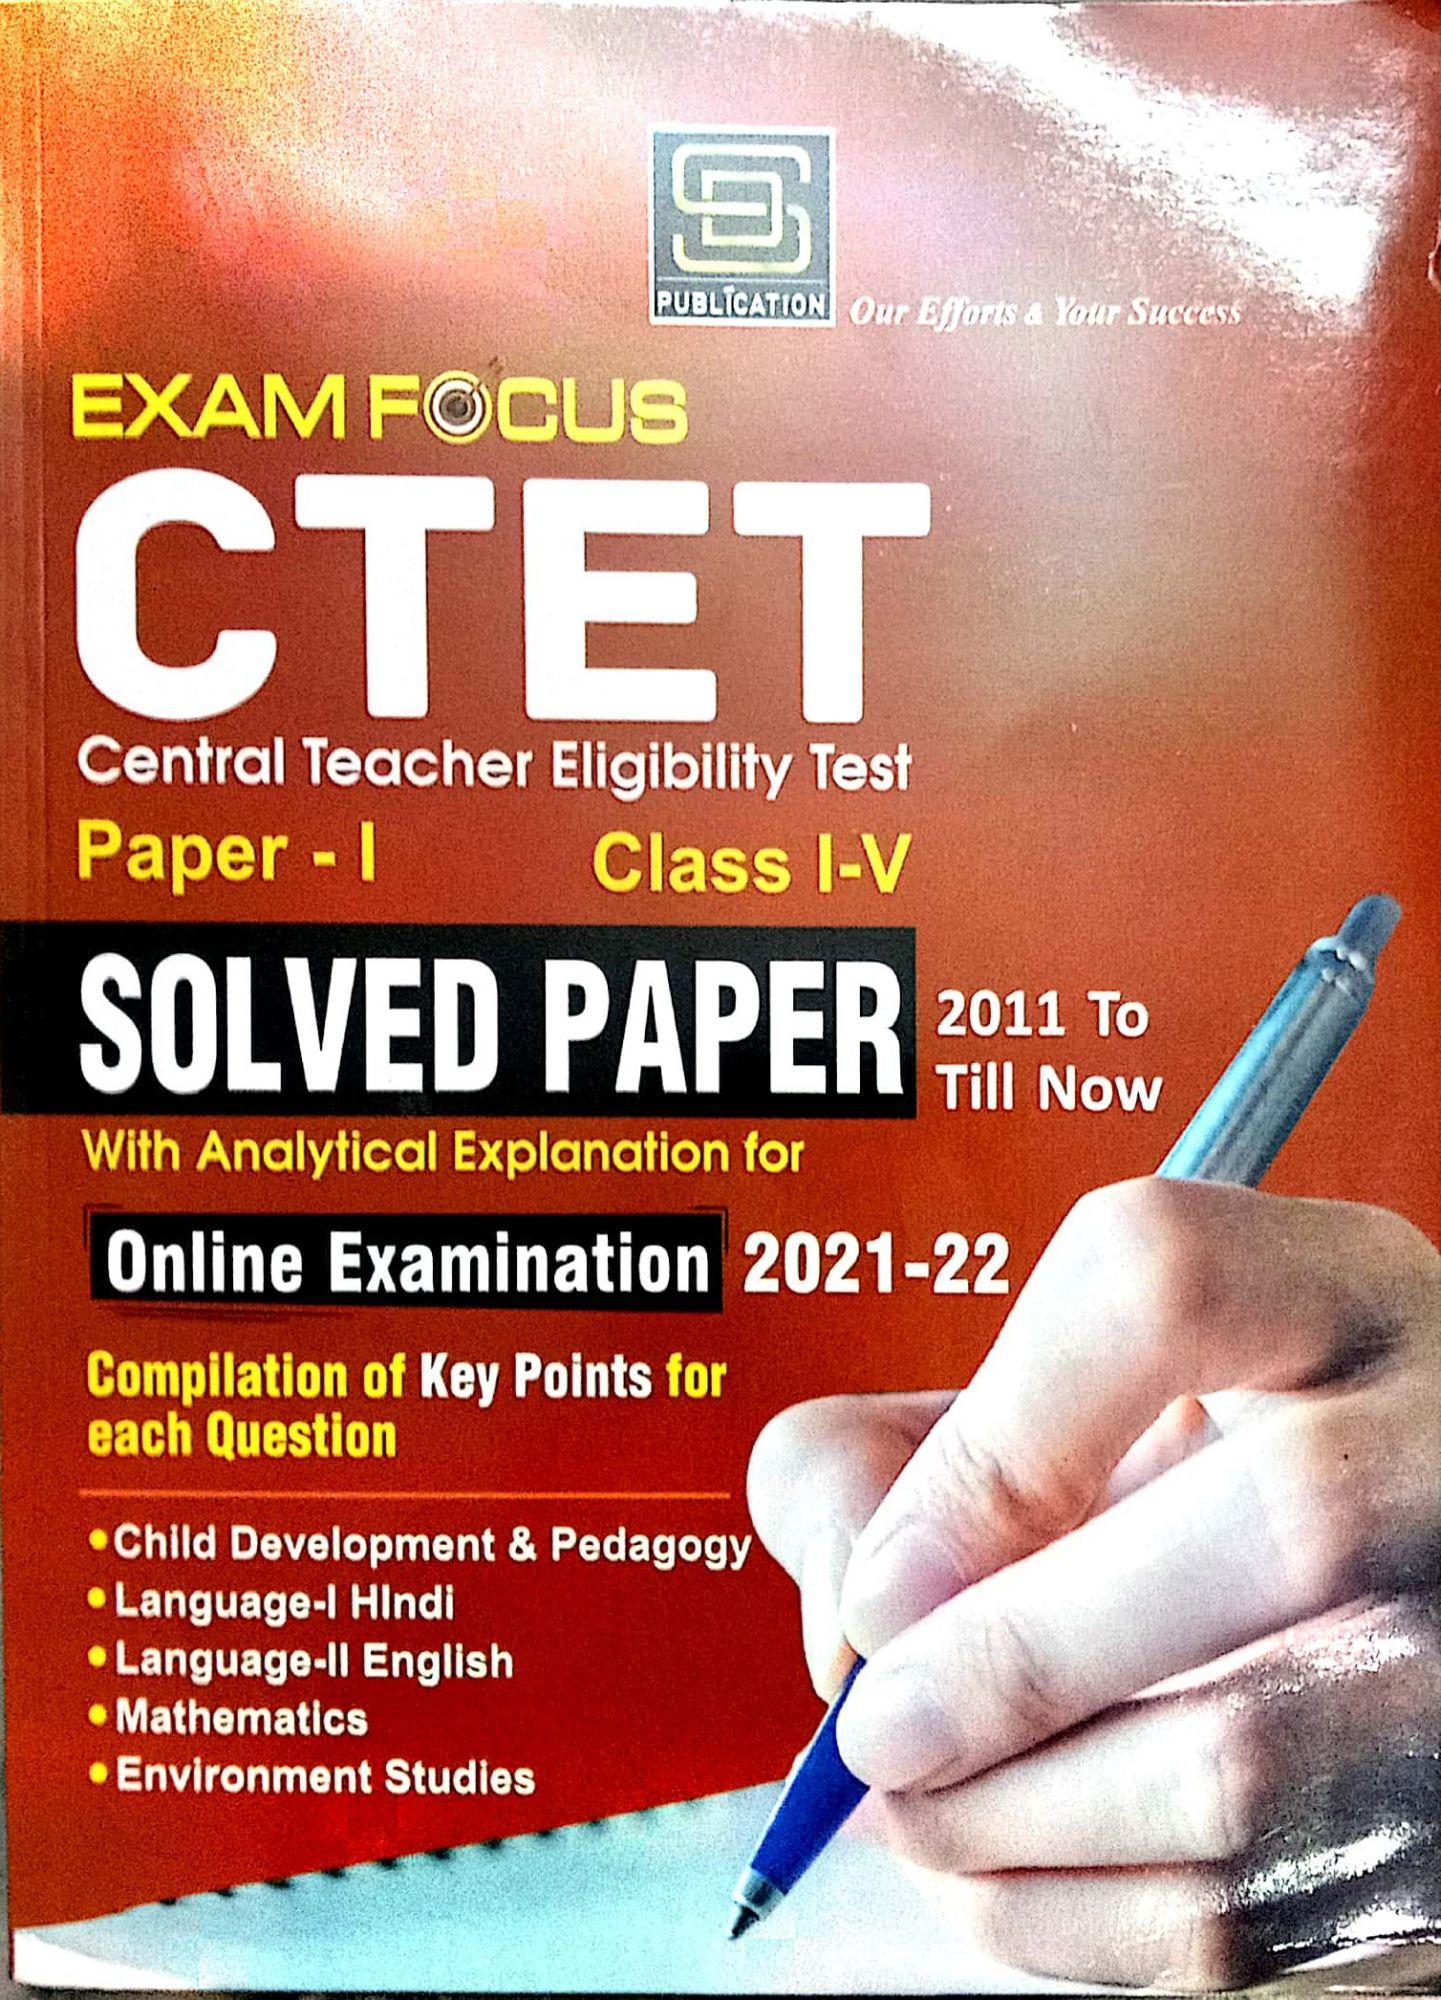 SD PUBLICATION CTET PAPER 1 SOLVED PAPER 2021